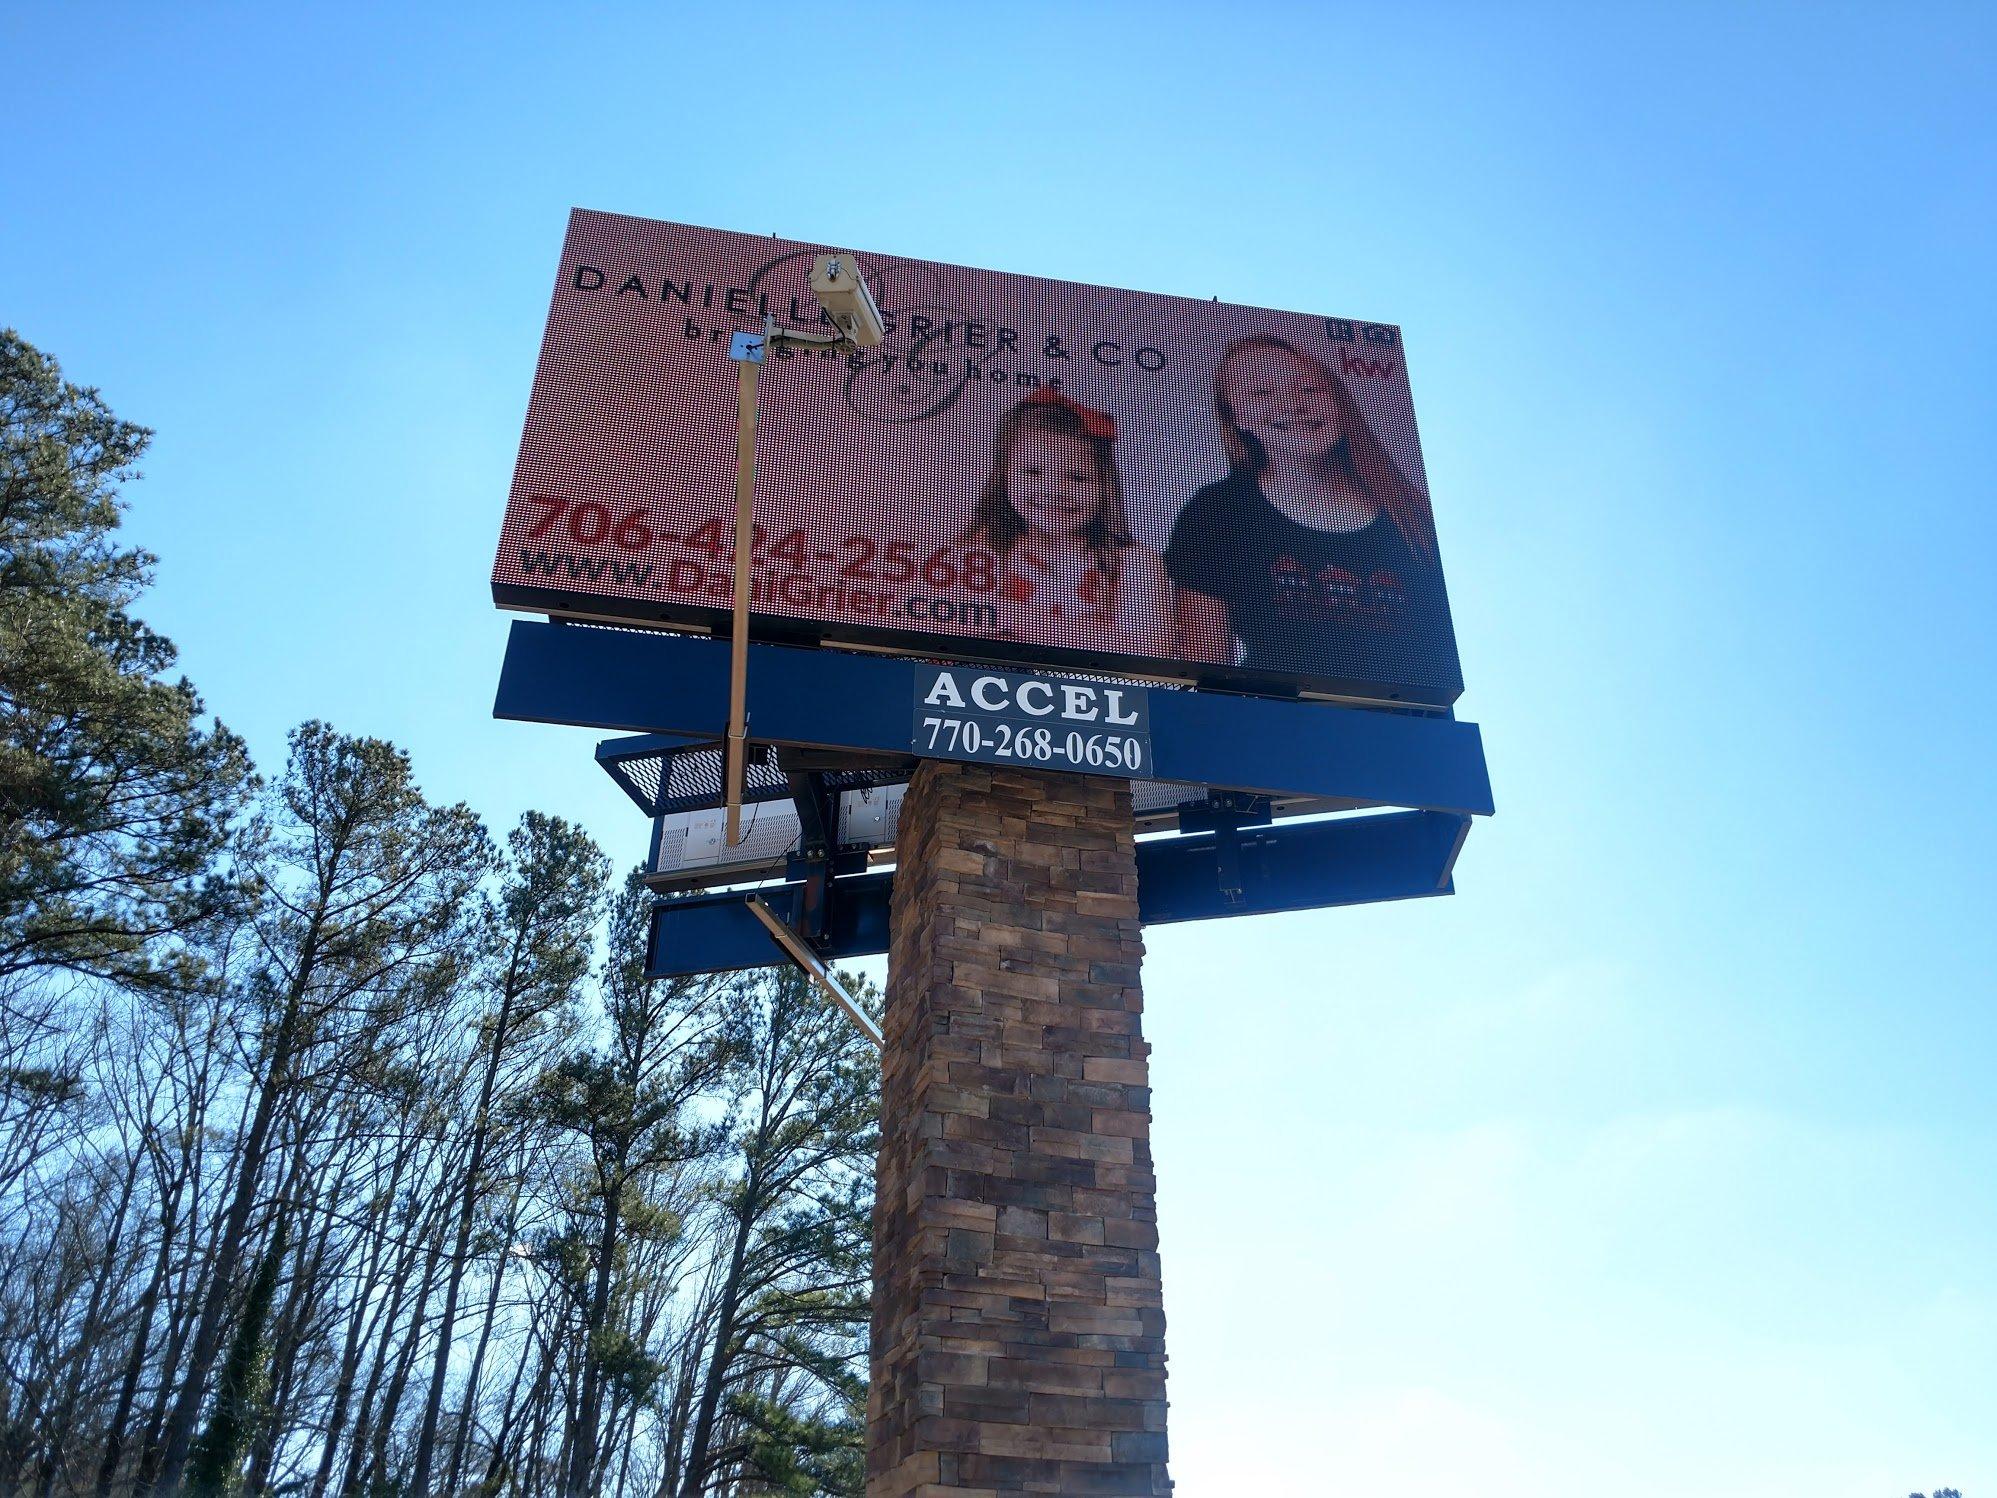 Outdoor-Advertising-Sign #1000 LHR CU -- 1-16-19